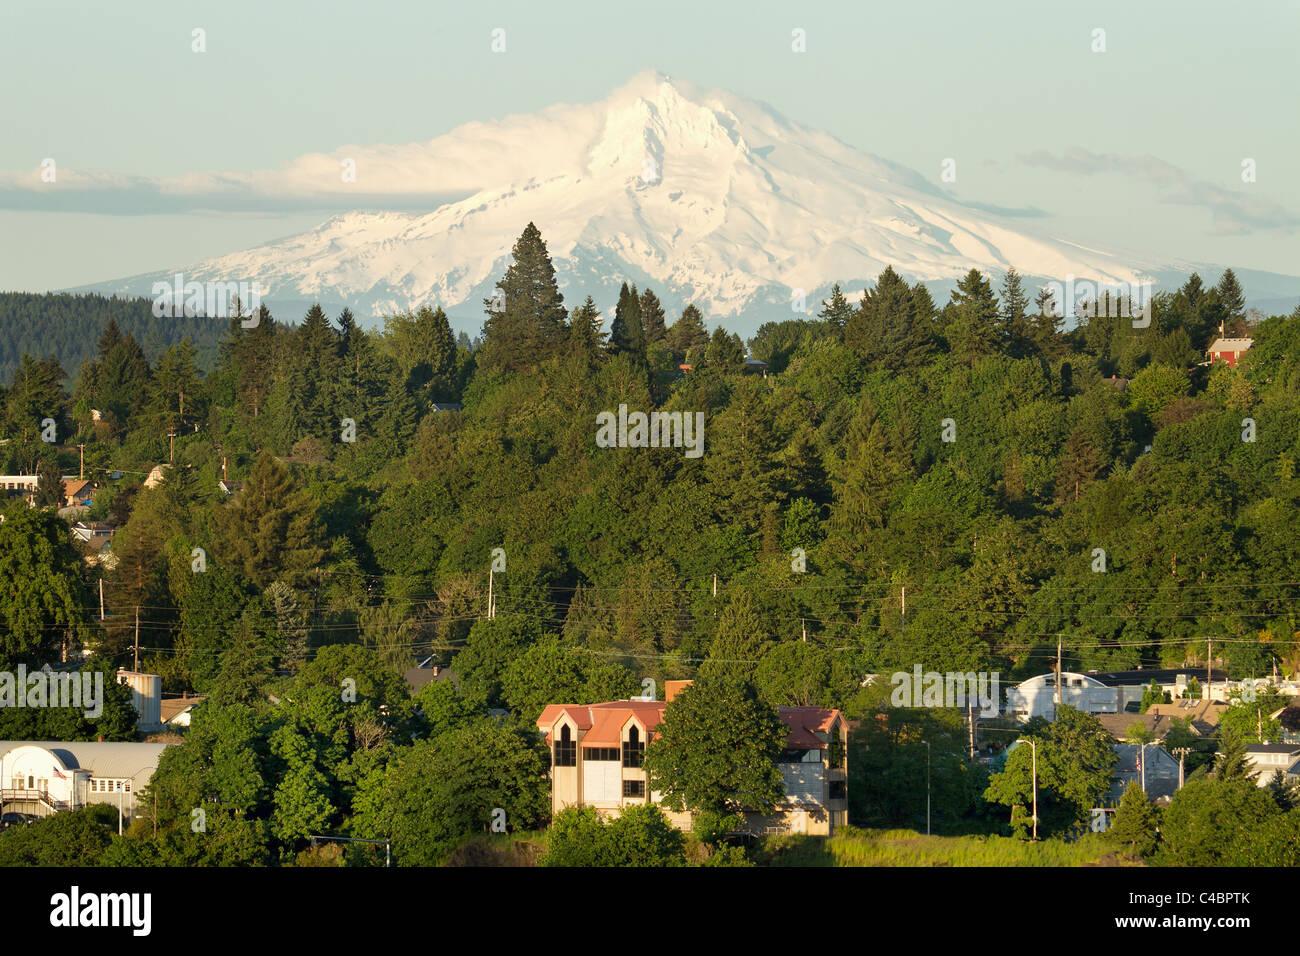 Mount Hood and Oregon City Landscape - Stock Image